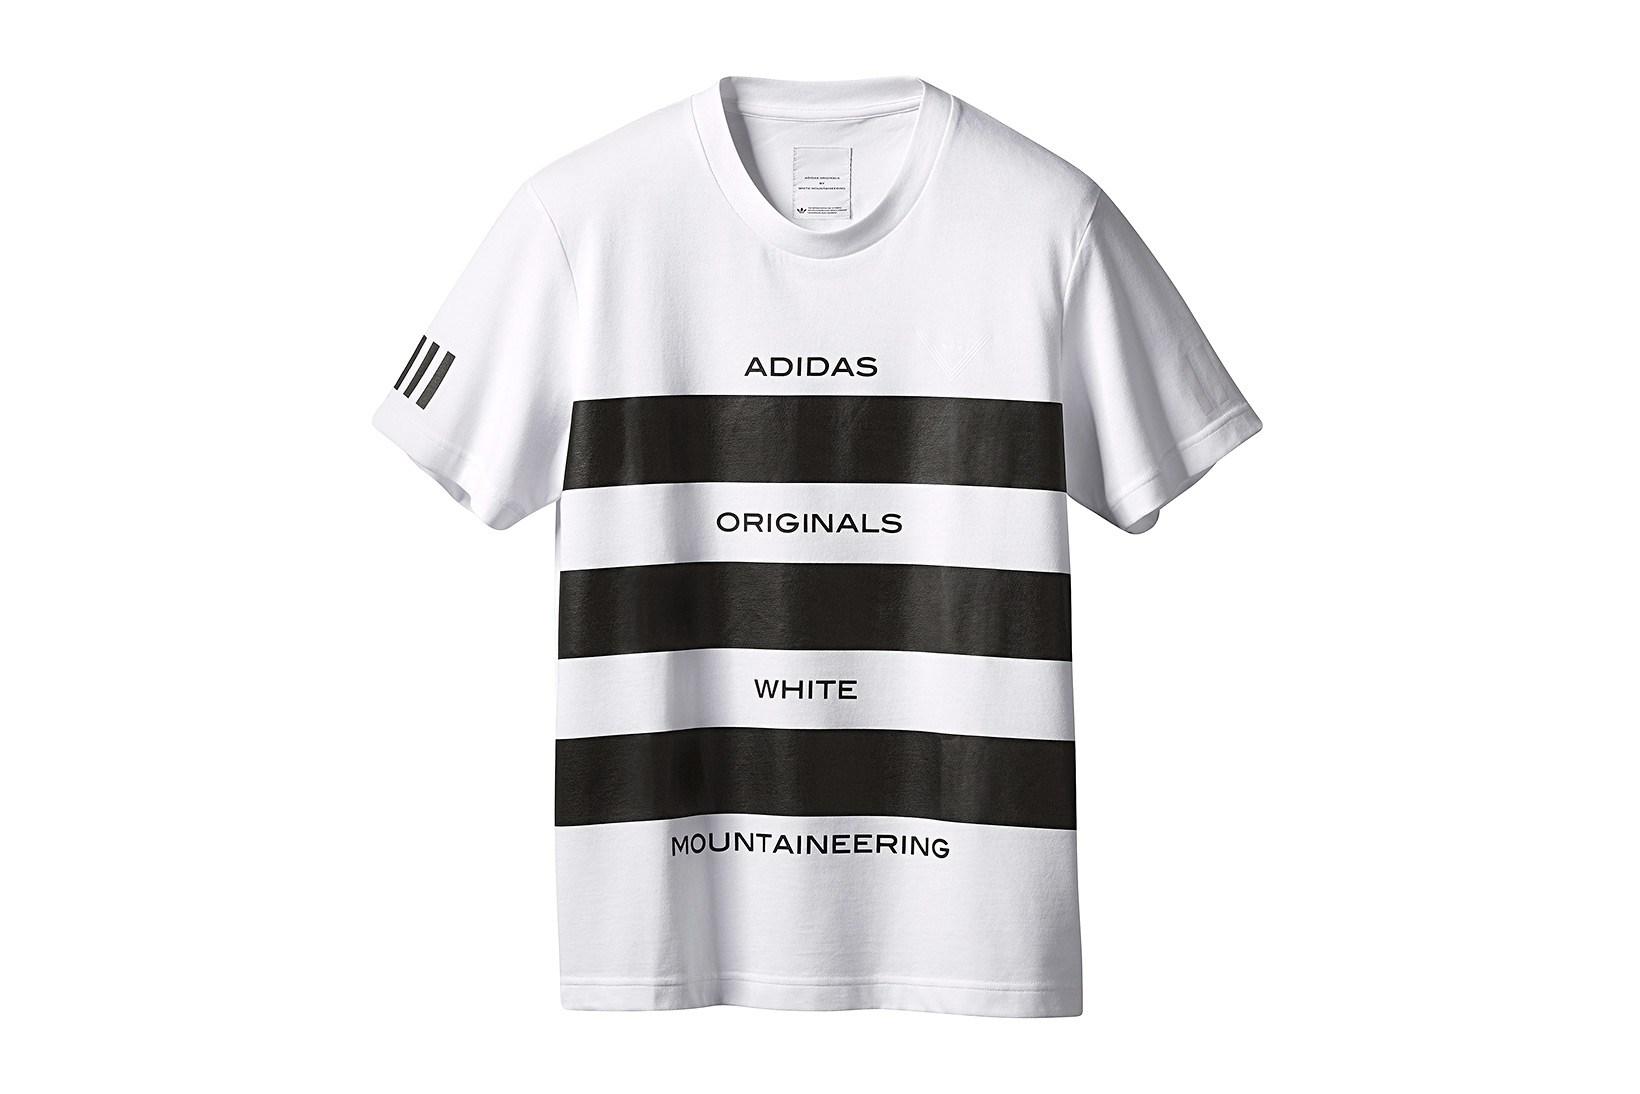 white-mountaineering-adidas-originals-closer-look-18